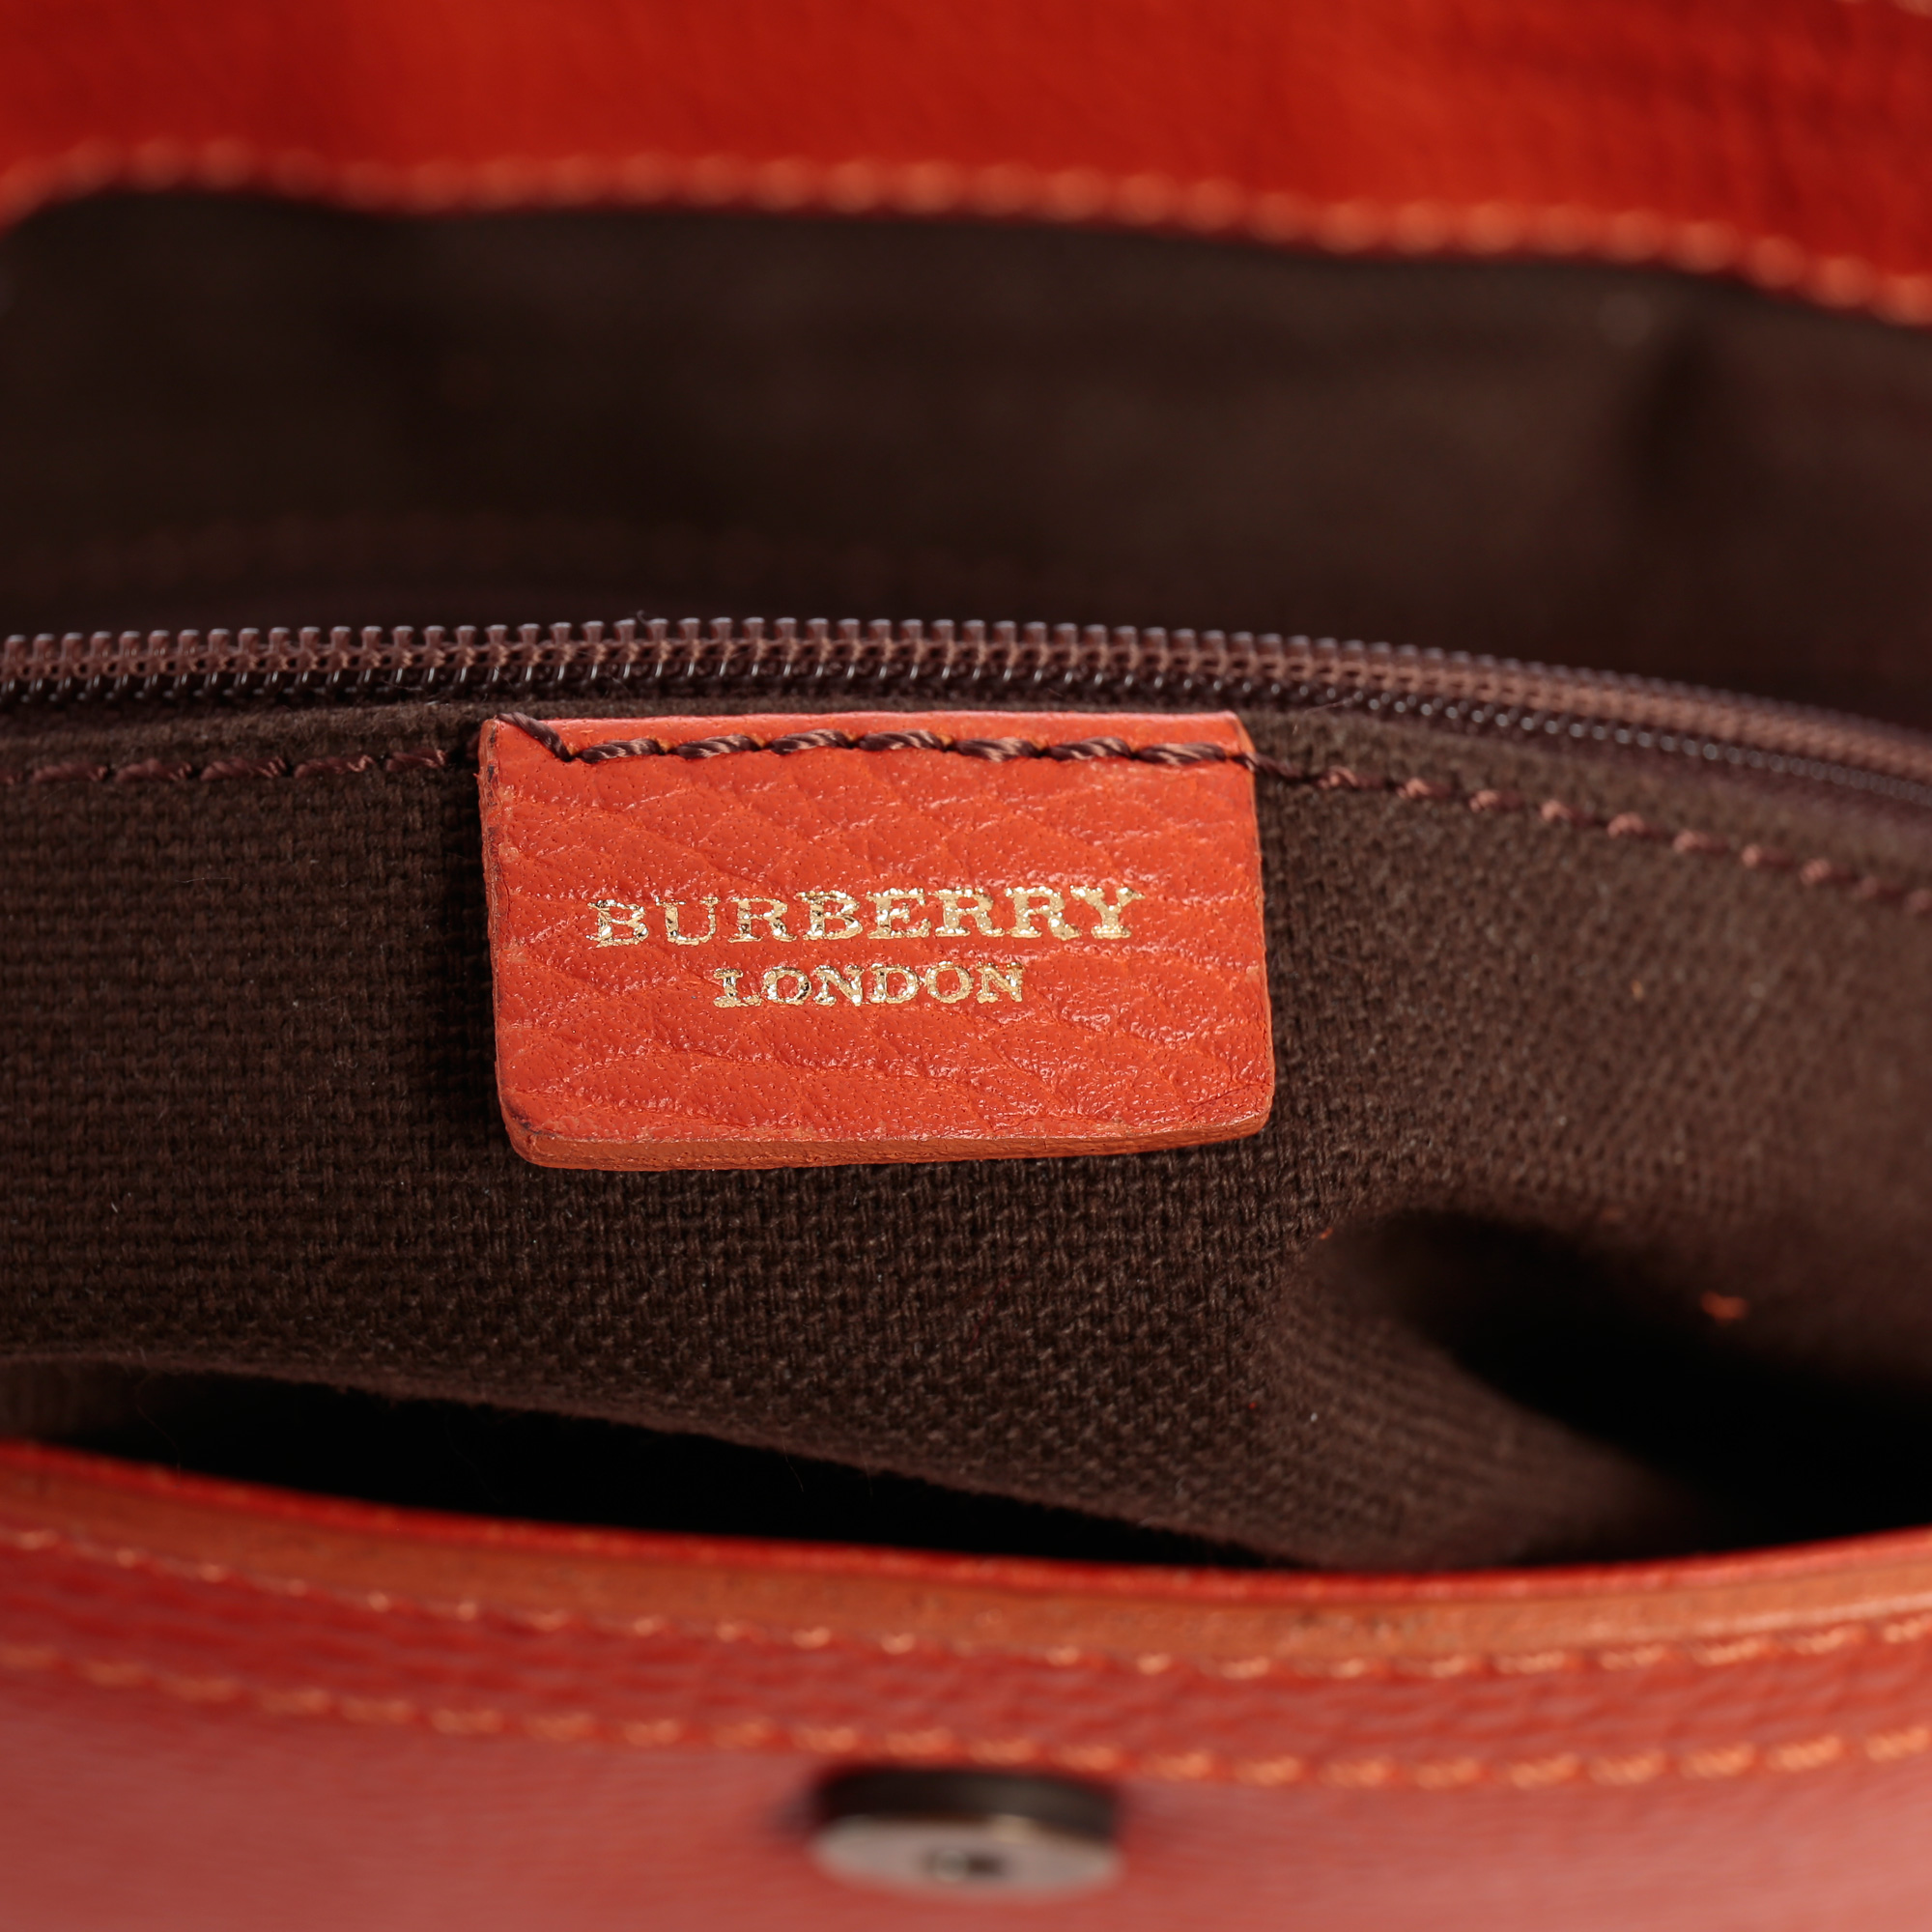 97ed12393cdf ... Shop Authentic Burberry Handbag Online india My Luxury Bargain Burberry  Orange Leather Shoulder Bag